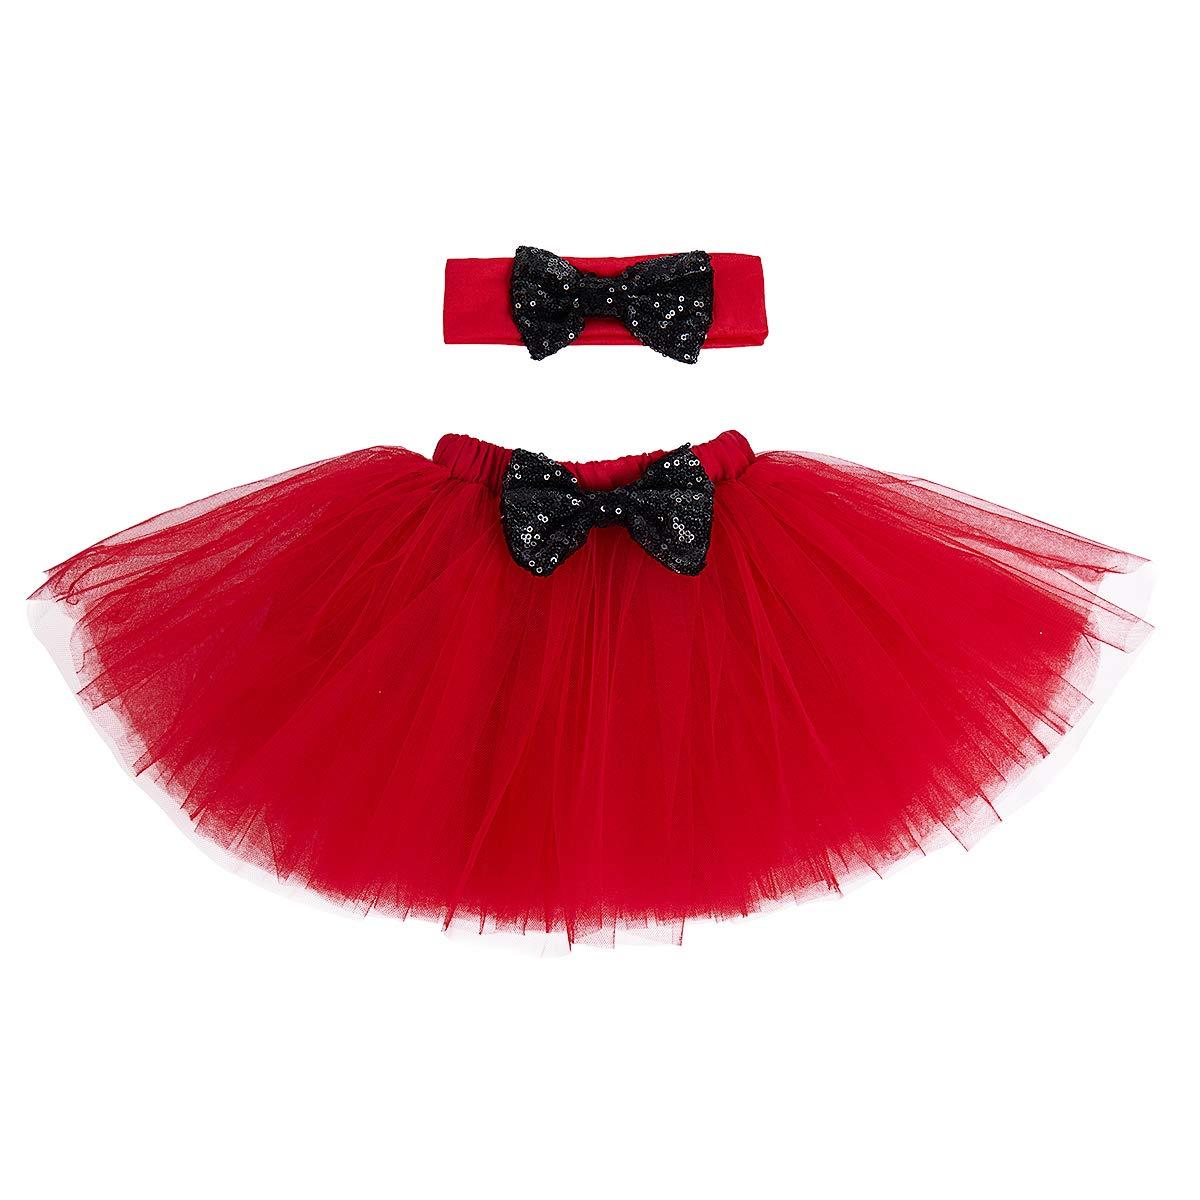 IBTOM CASTLE Baby Girls 1st Birthday Cake Smash 3pcs Outfits Set Skirt Clothes